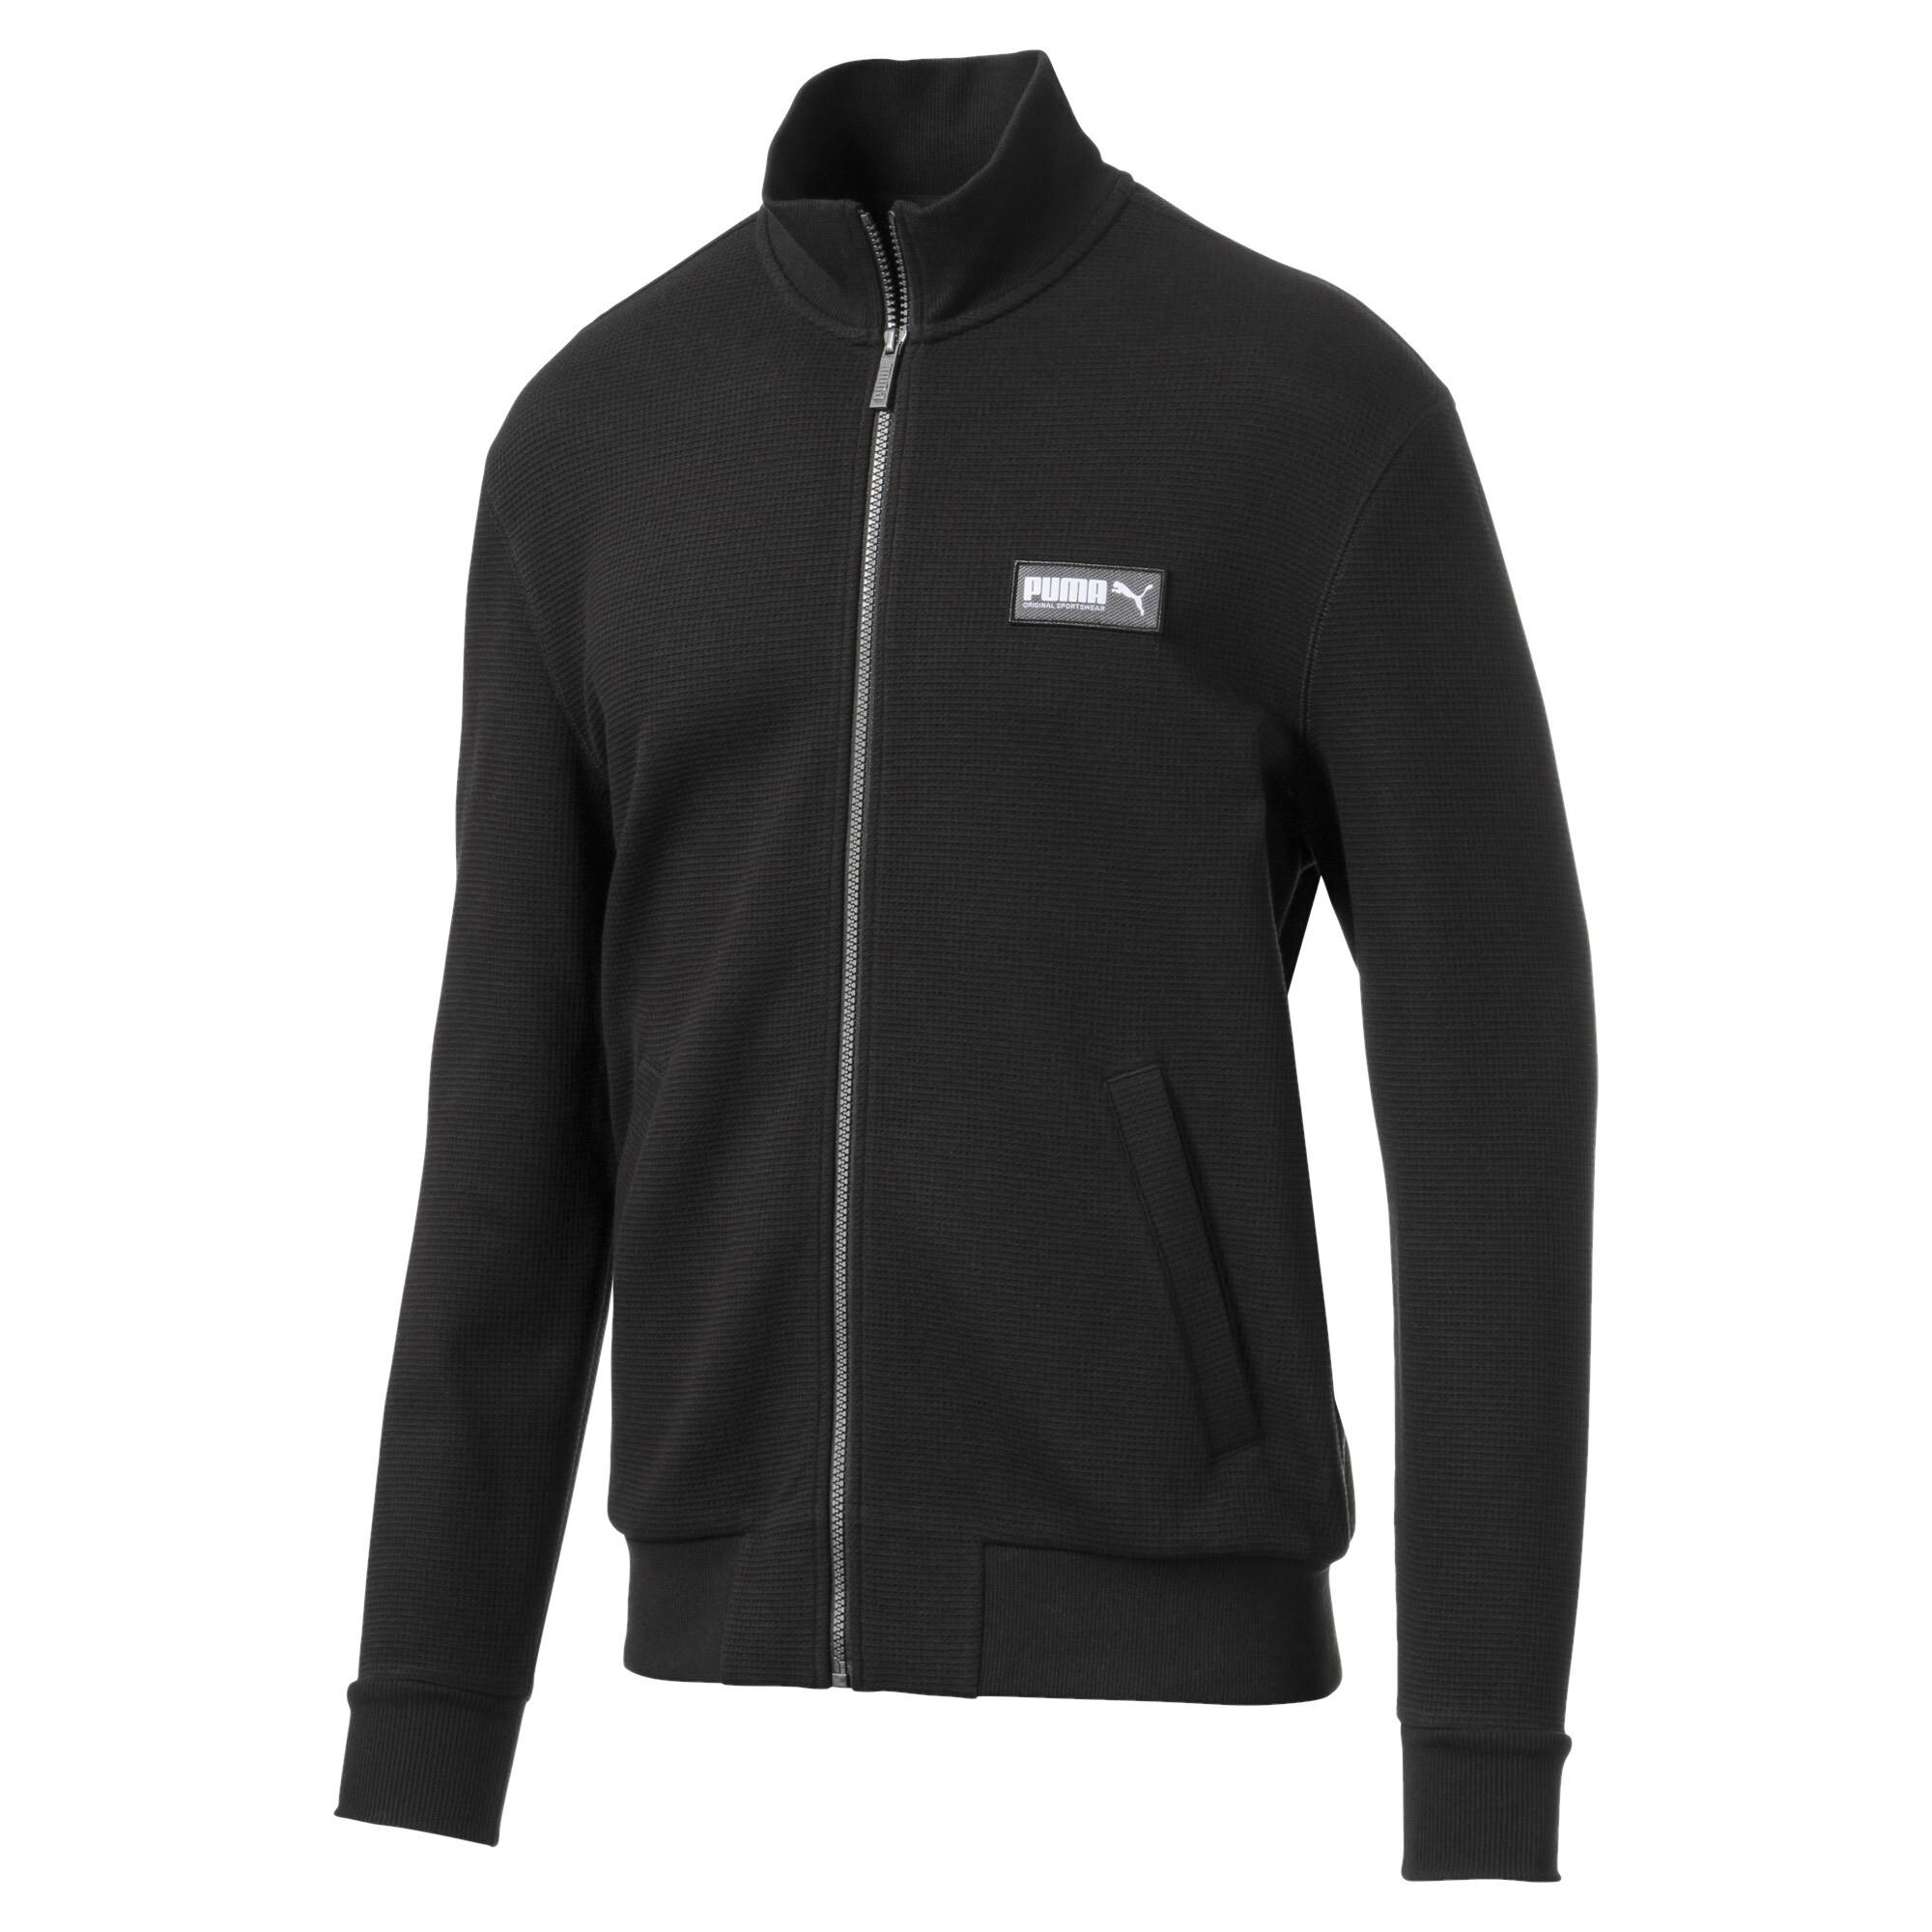 PUMA-Fusion-Men-039-s-Jacket-Men-Sweat-Basics thumbnail 2